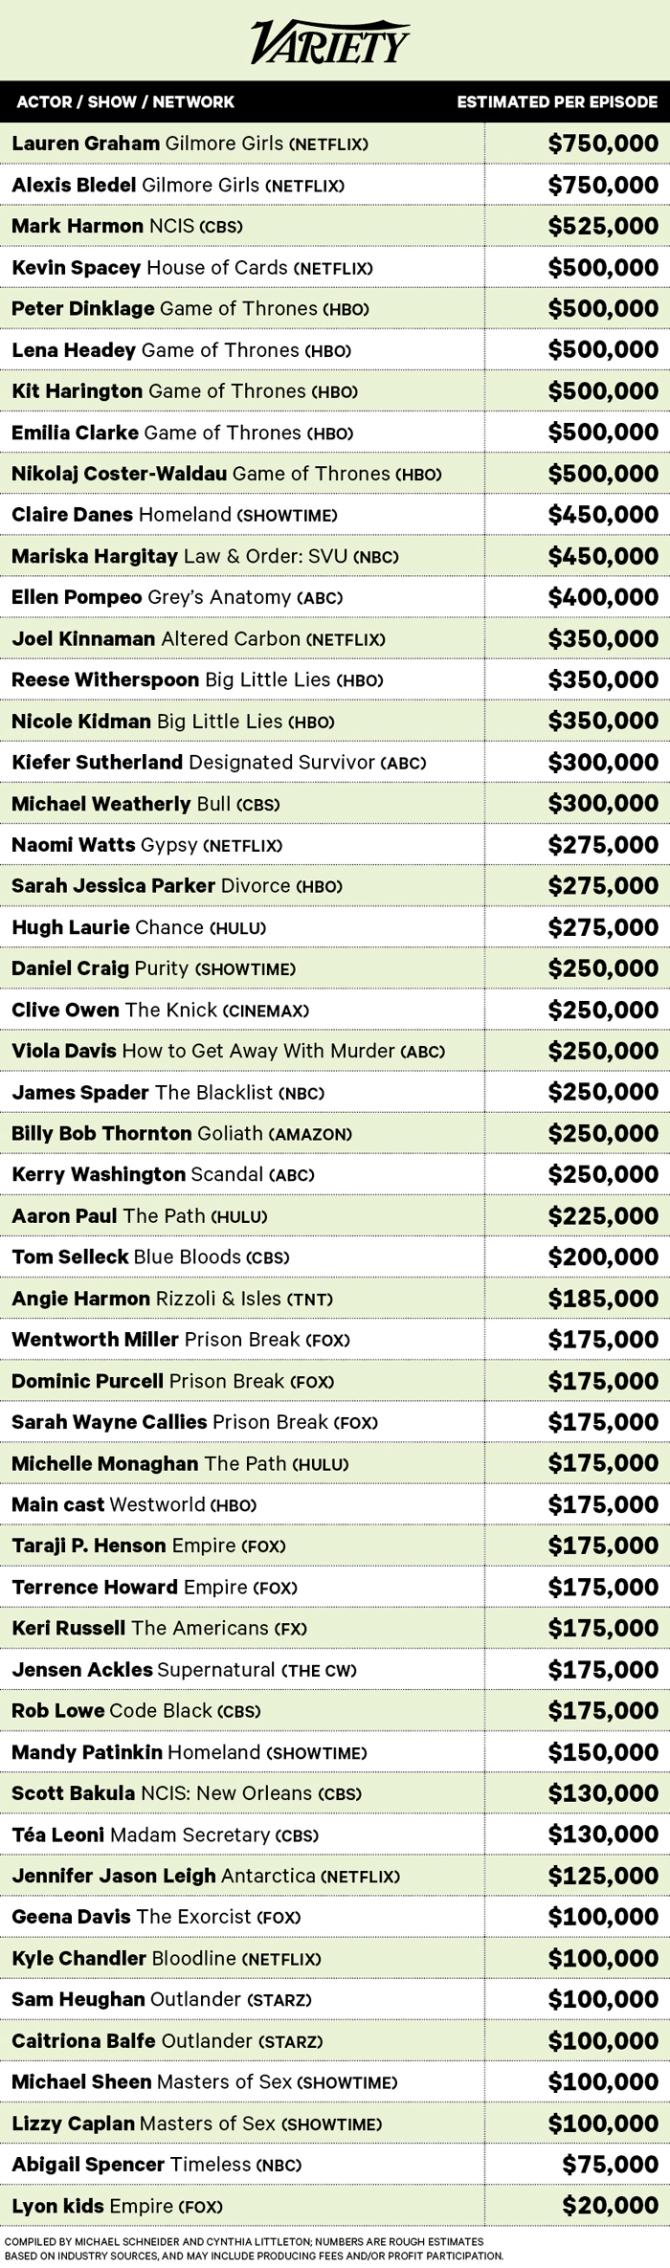 drama chart - Τηλεόραση vs Σινεμά: Οι πιο ακριβοπληρωμένοι ηθοποιοί